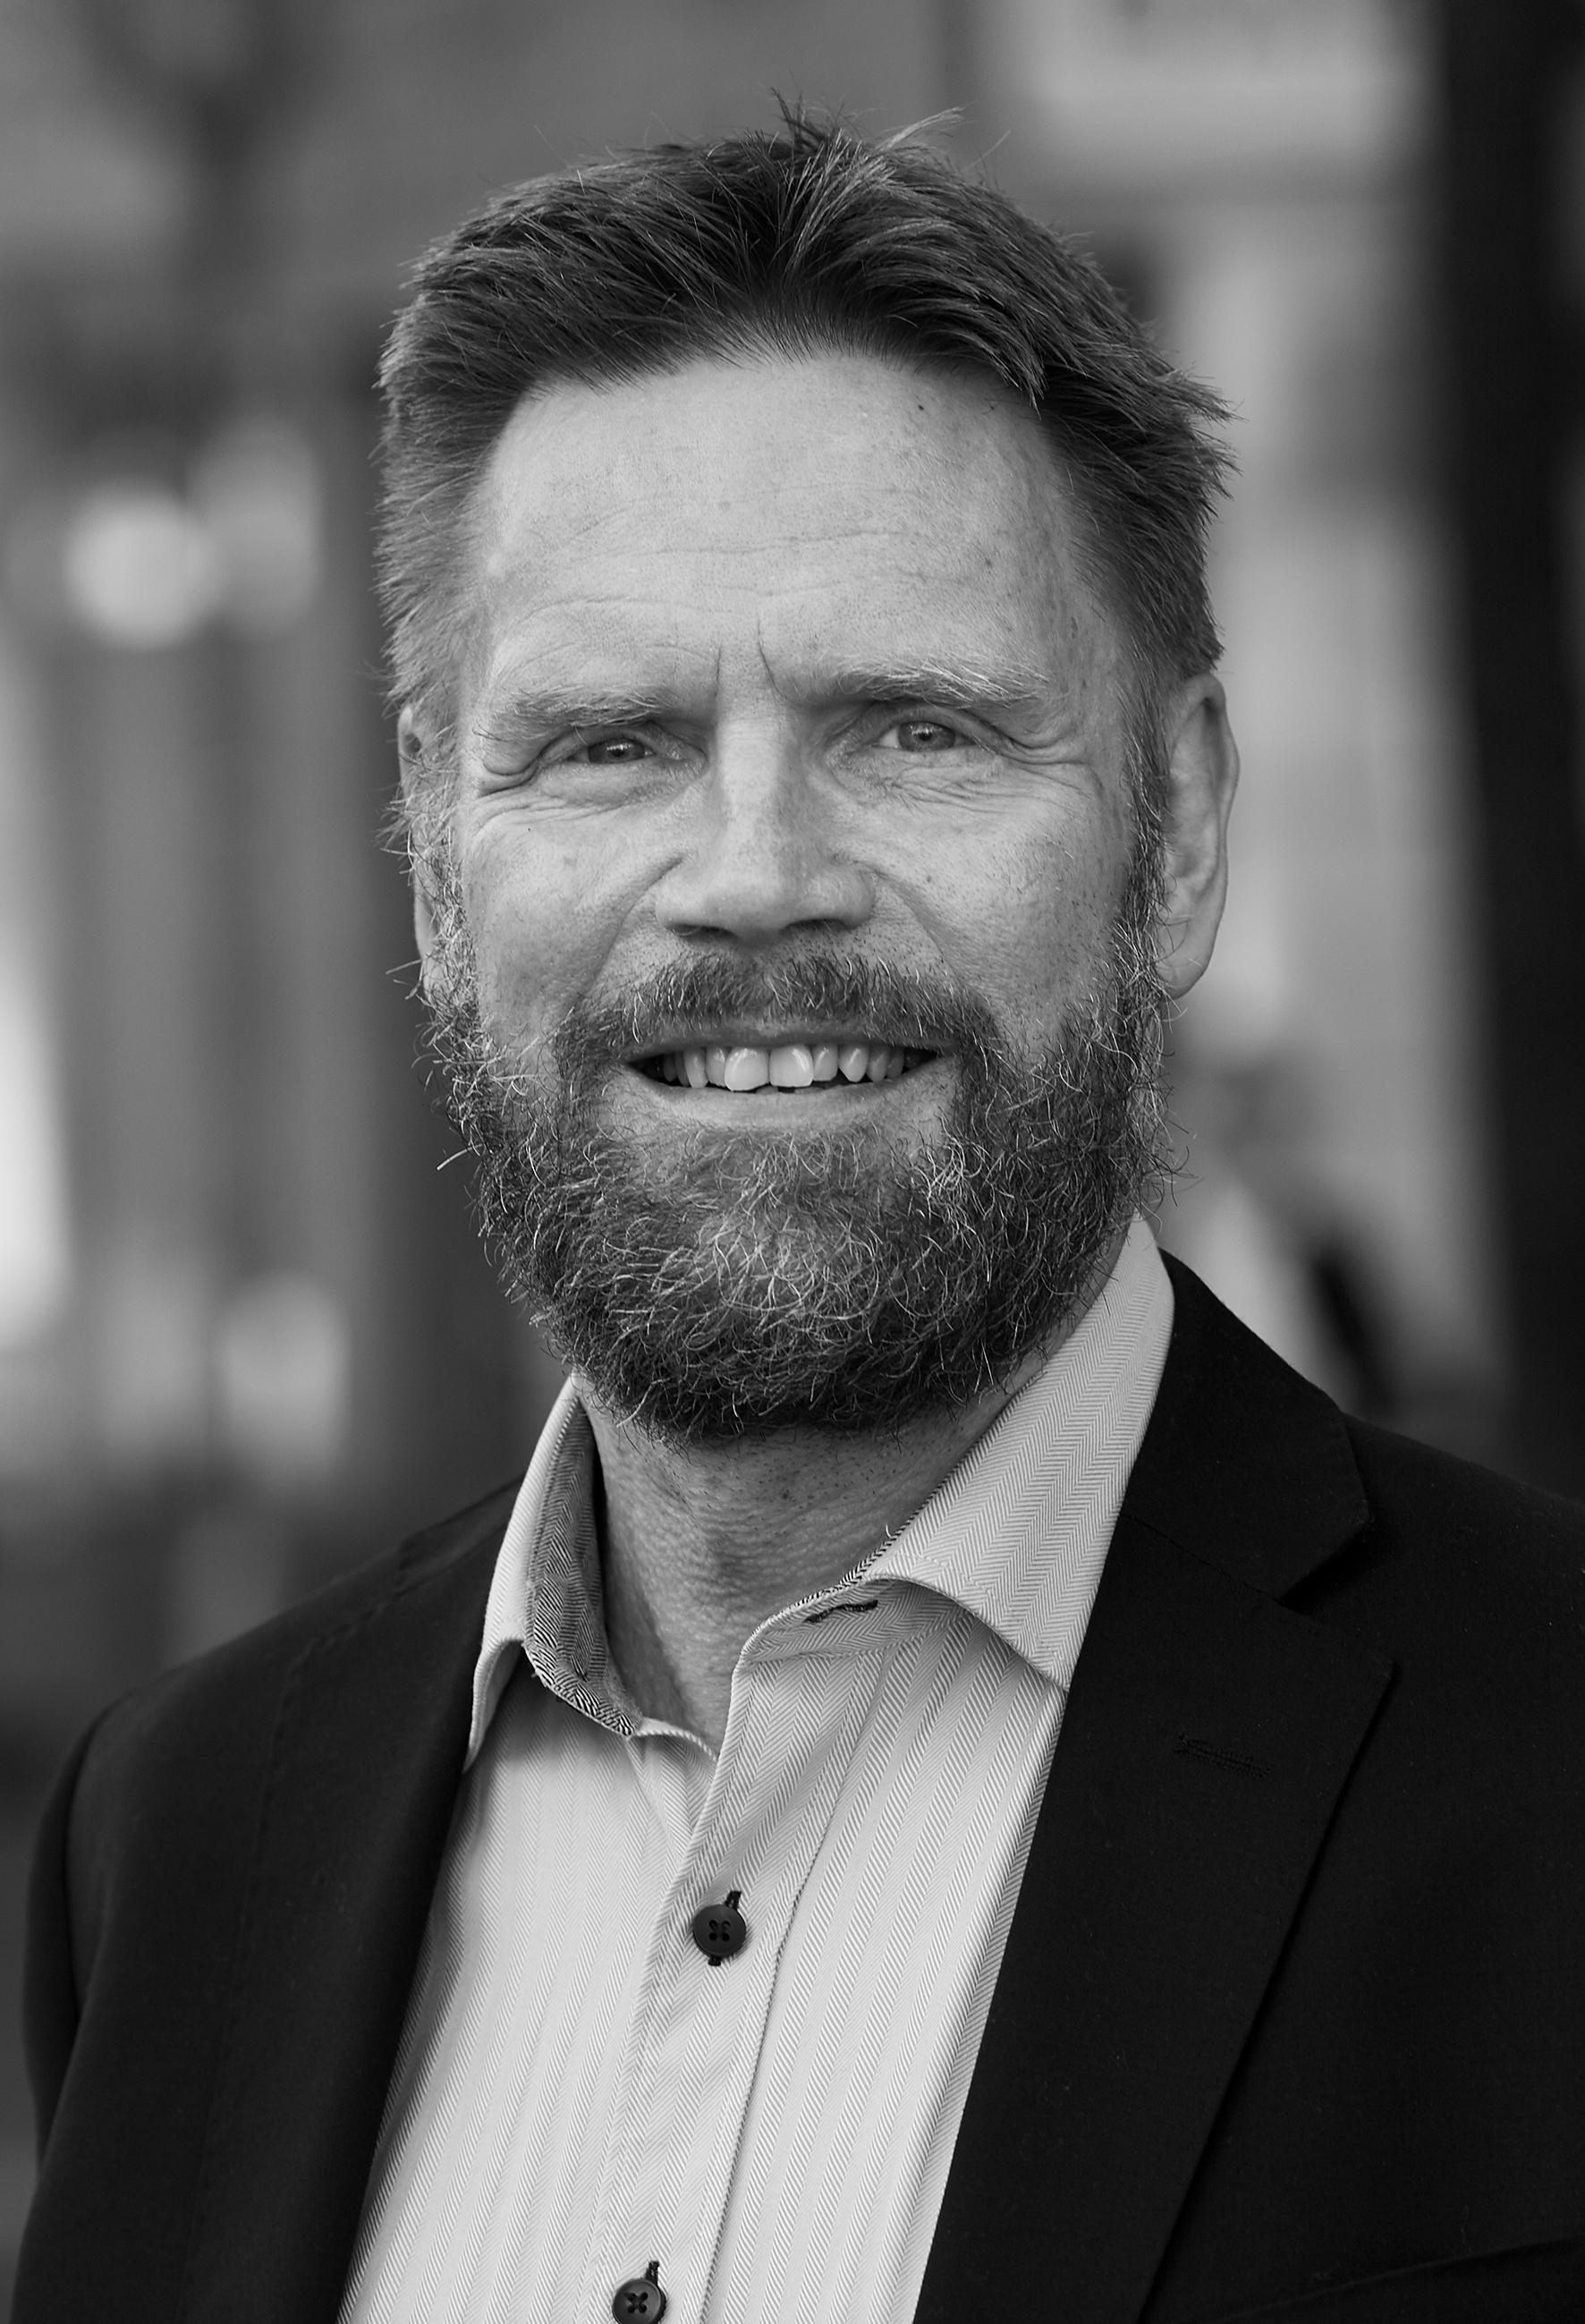 Torbjörn Hedberg